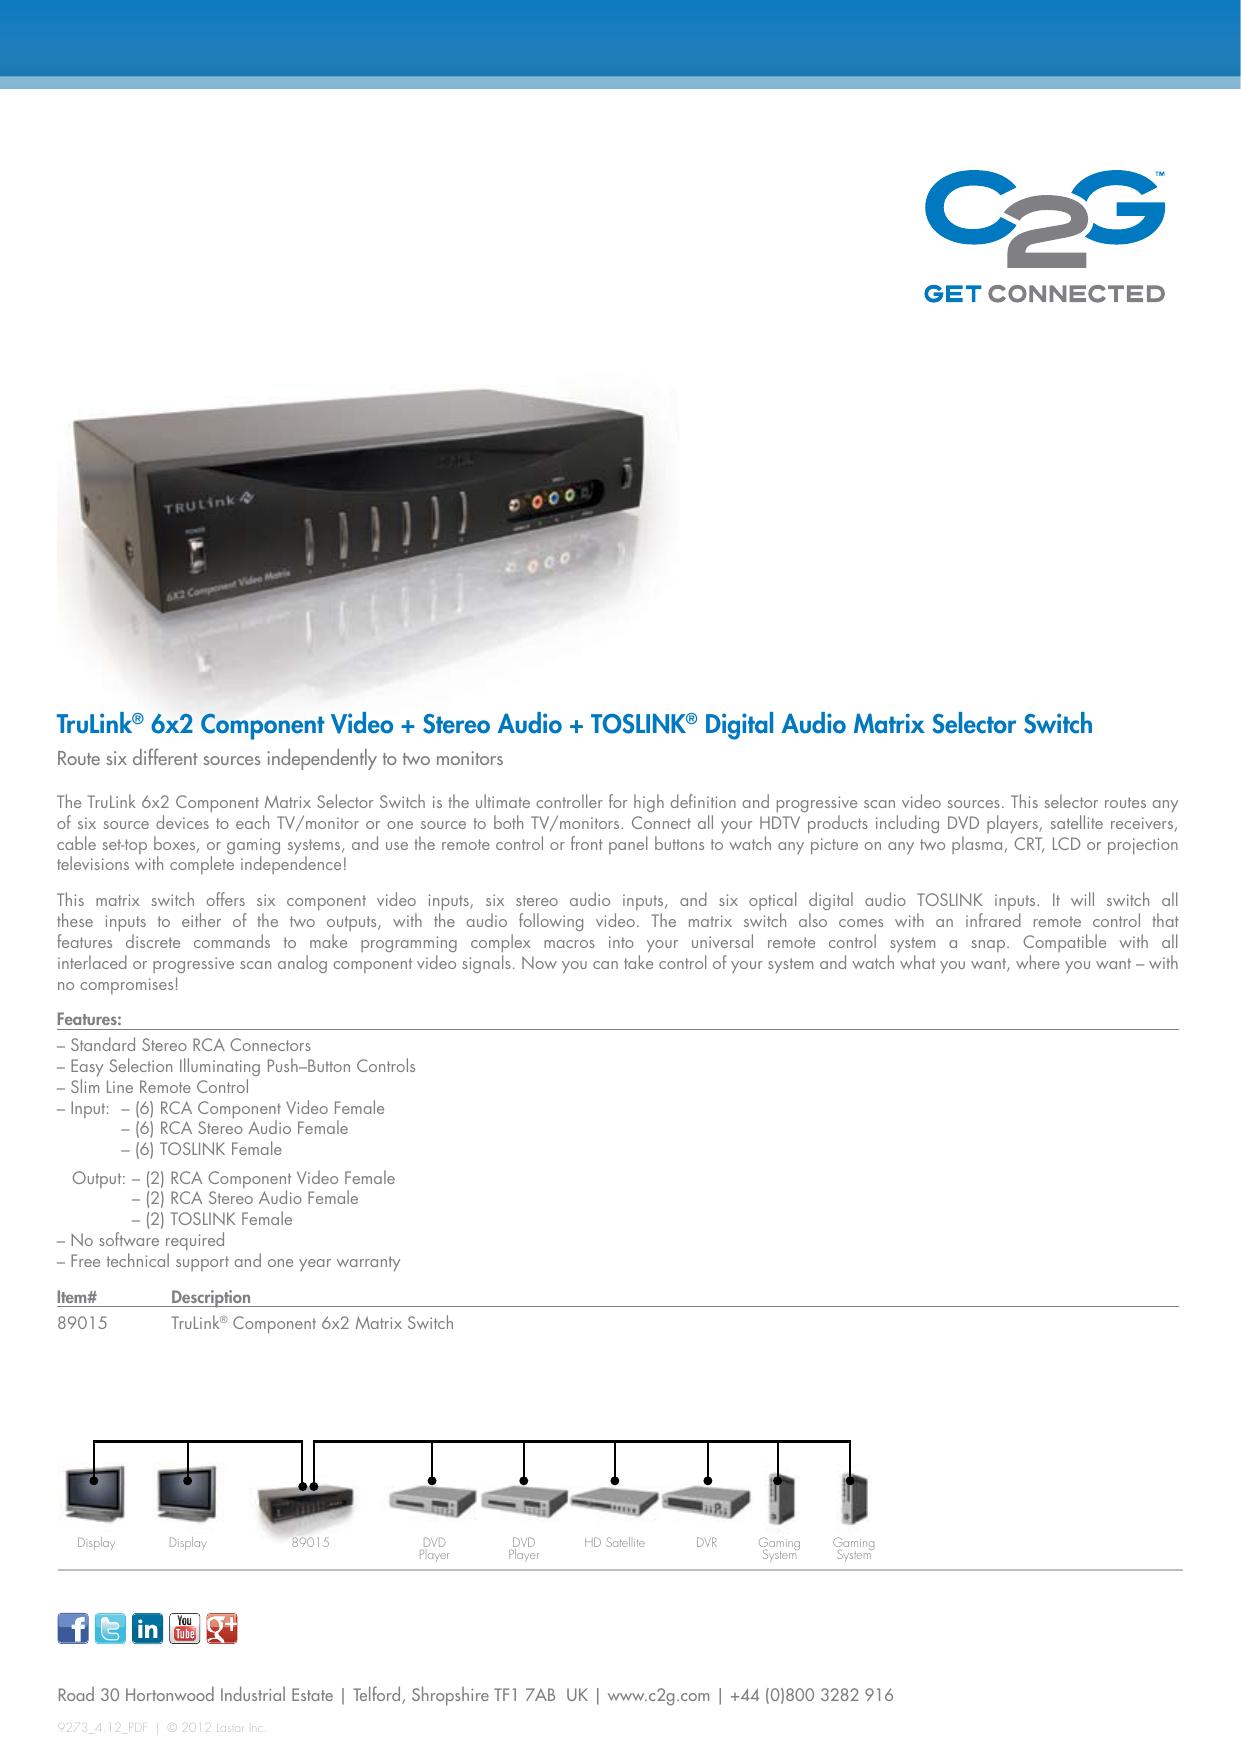 TruLinkR 6x2 Component Video Stereo Audio ToSLinkR Digital